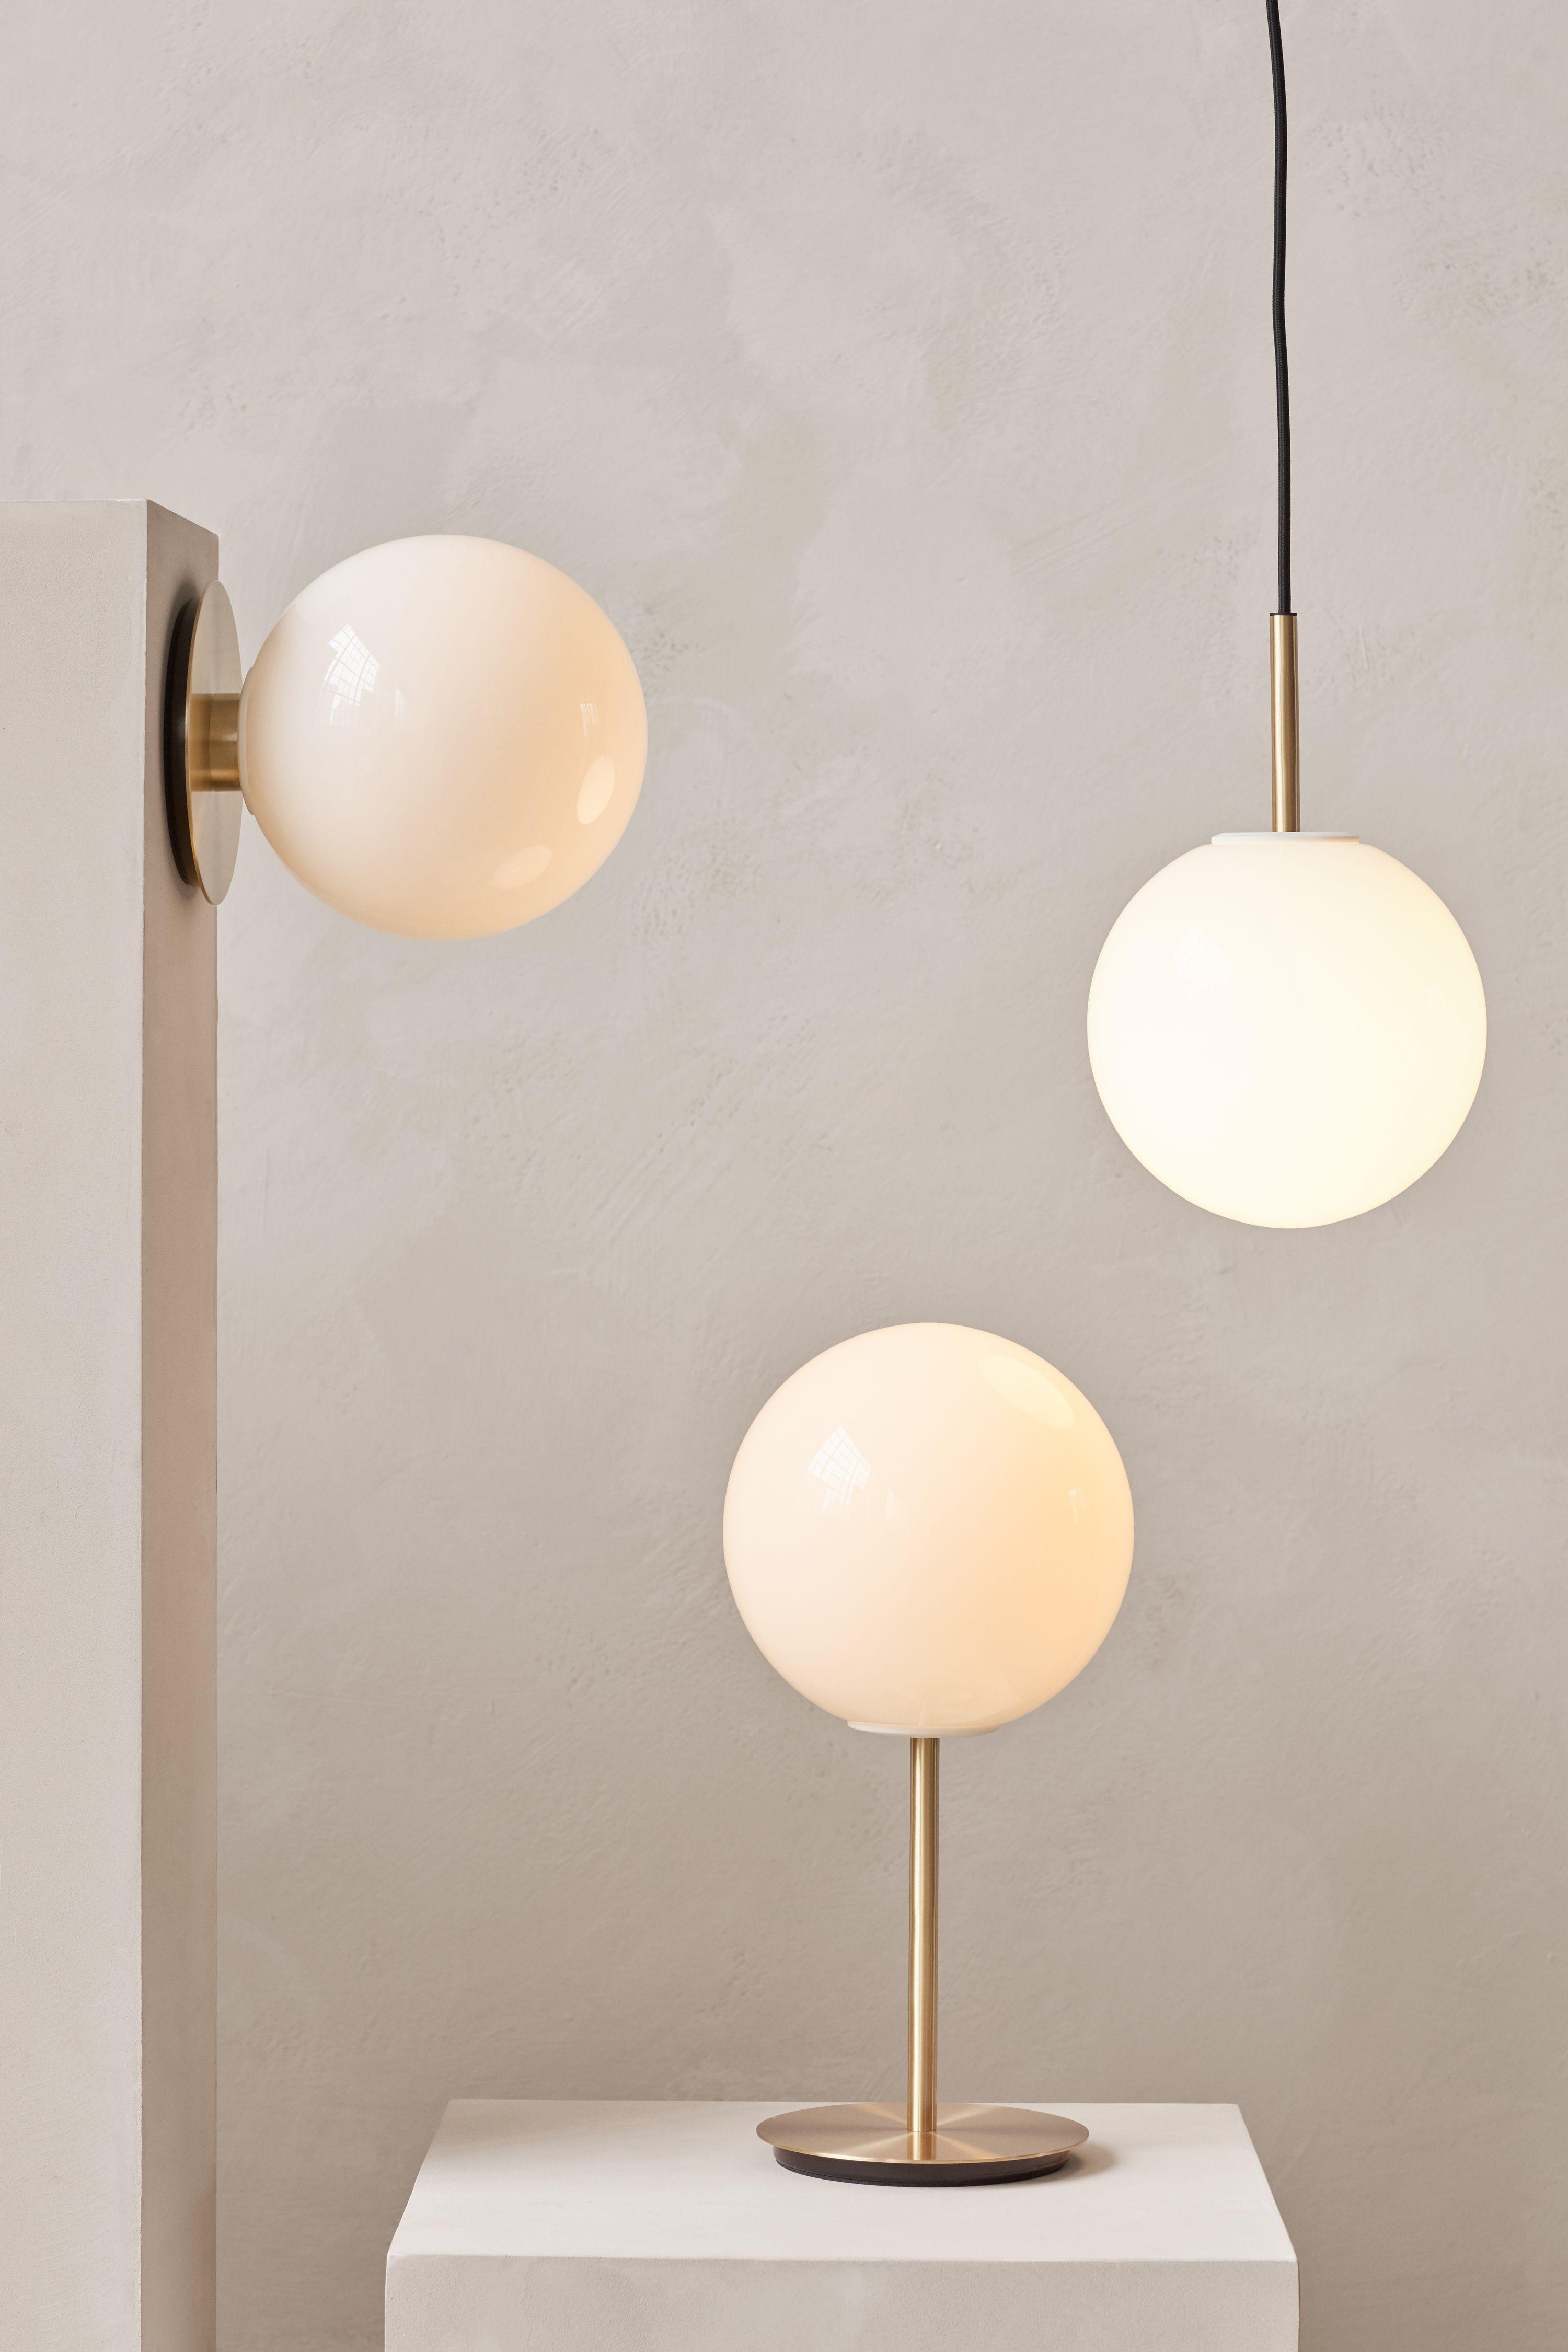 nomadic lamps presented